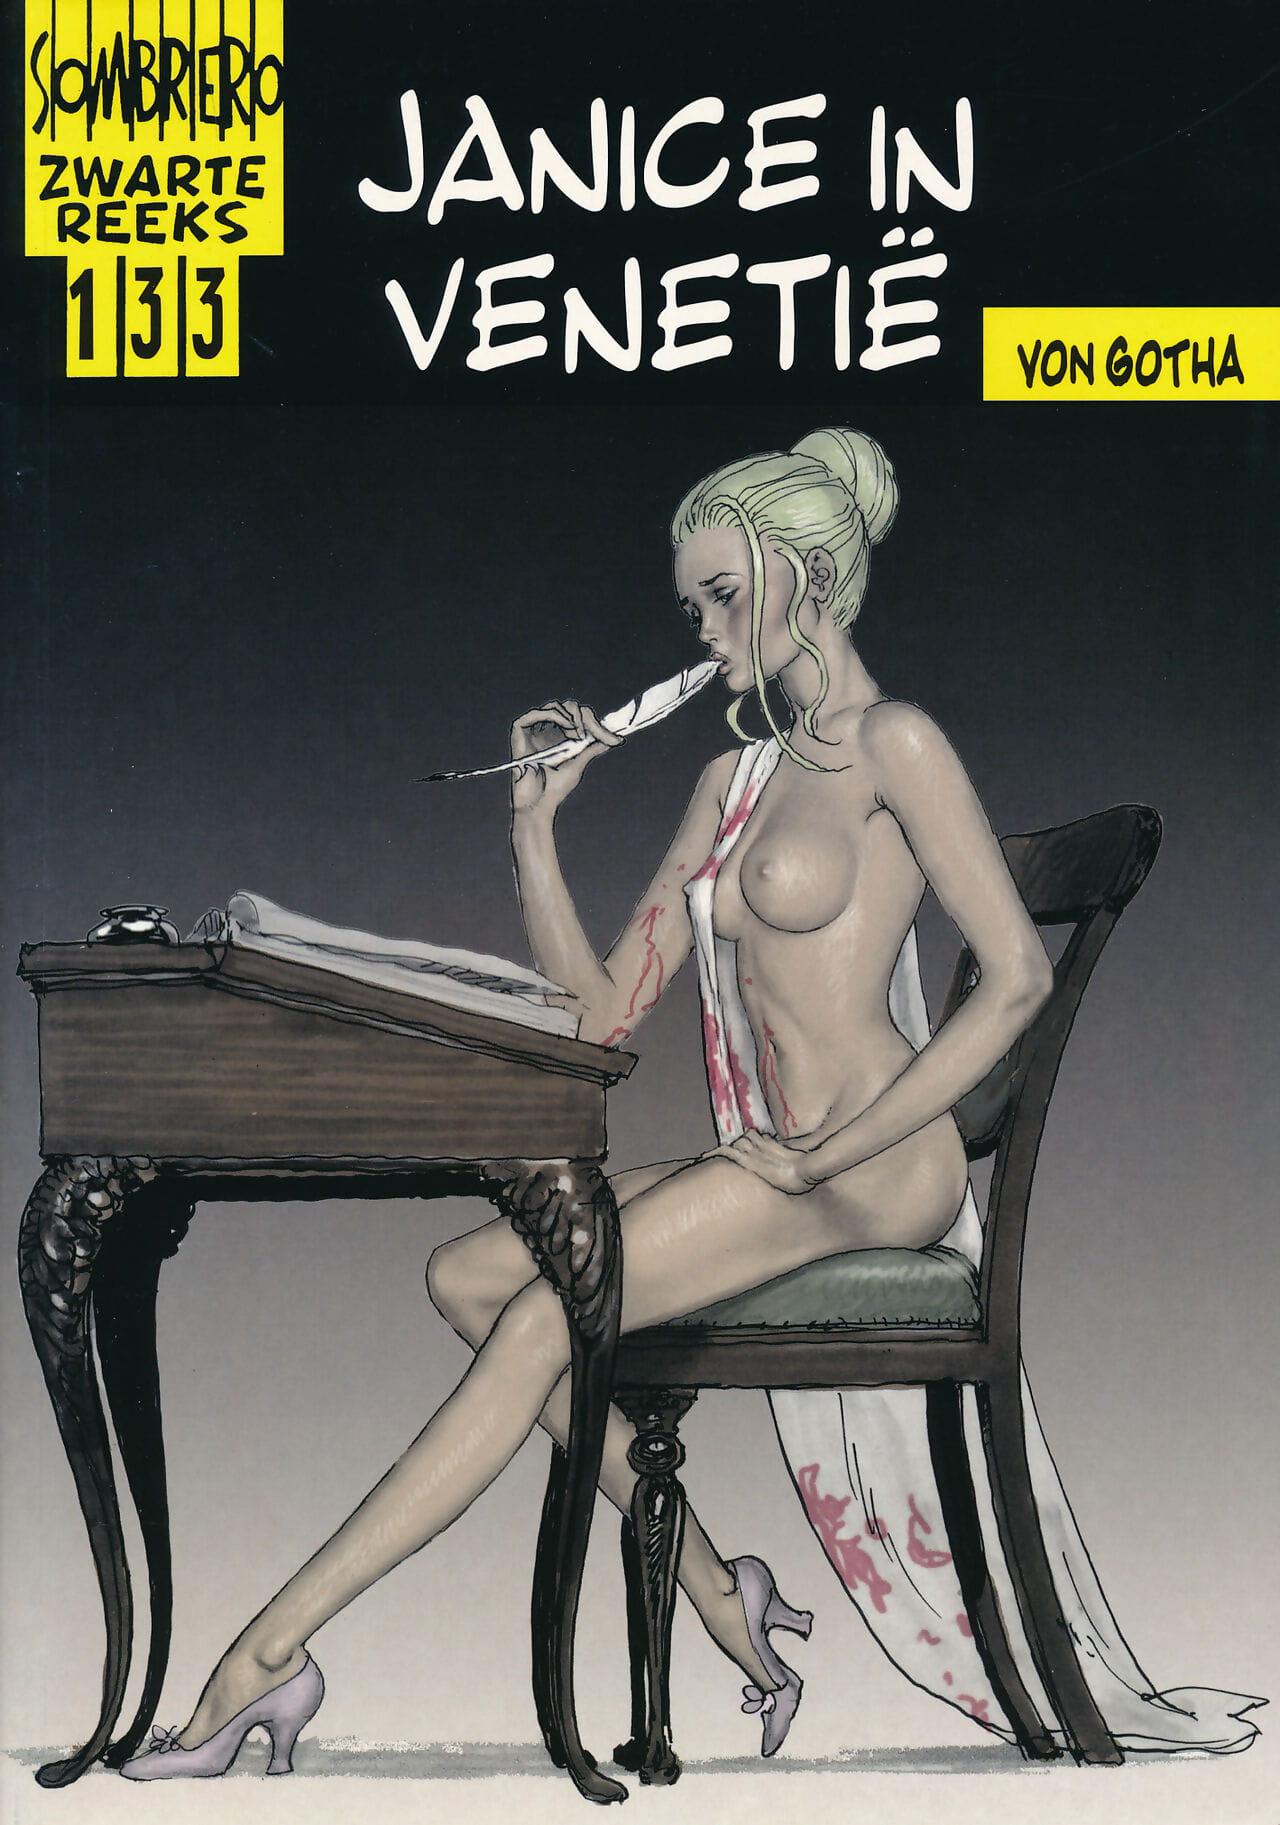 Janice regarding Venetie